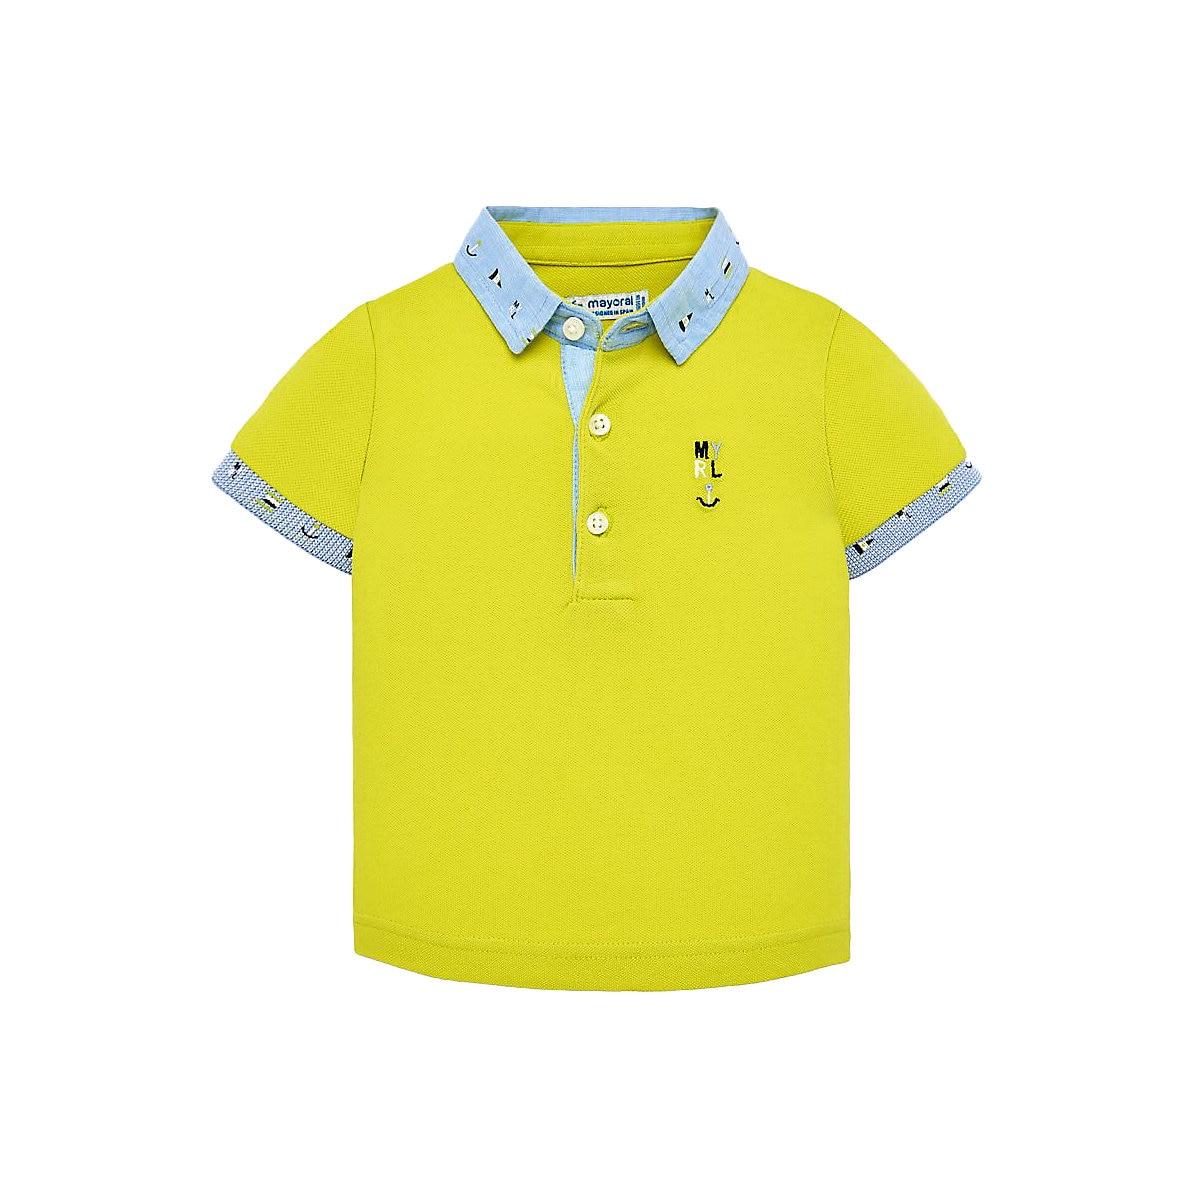 MAYORAL Polo Shirts 10693158 Children Clothing T-shirt Shirt The Print For Boys